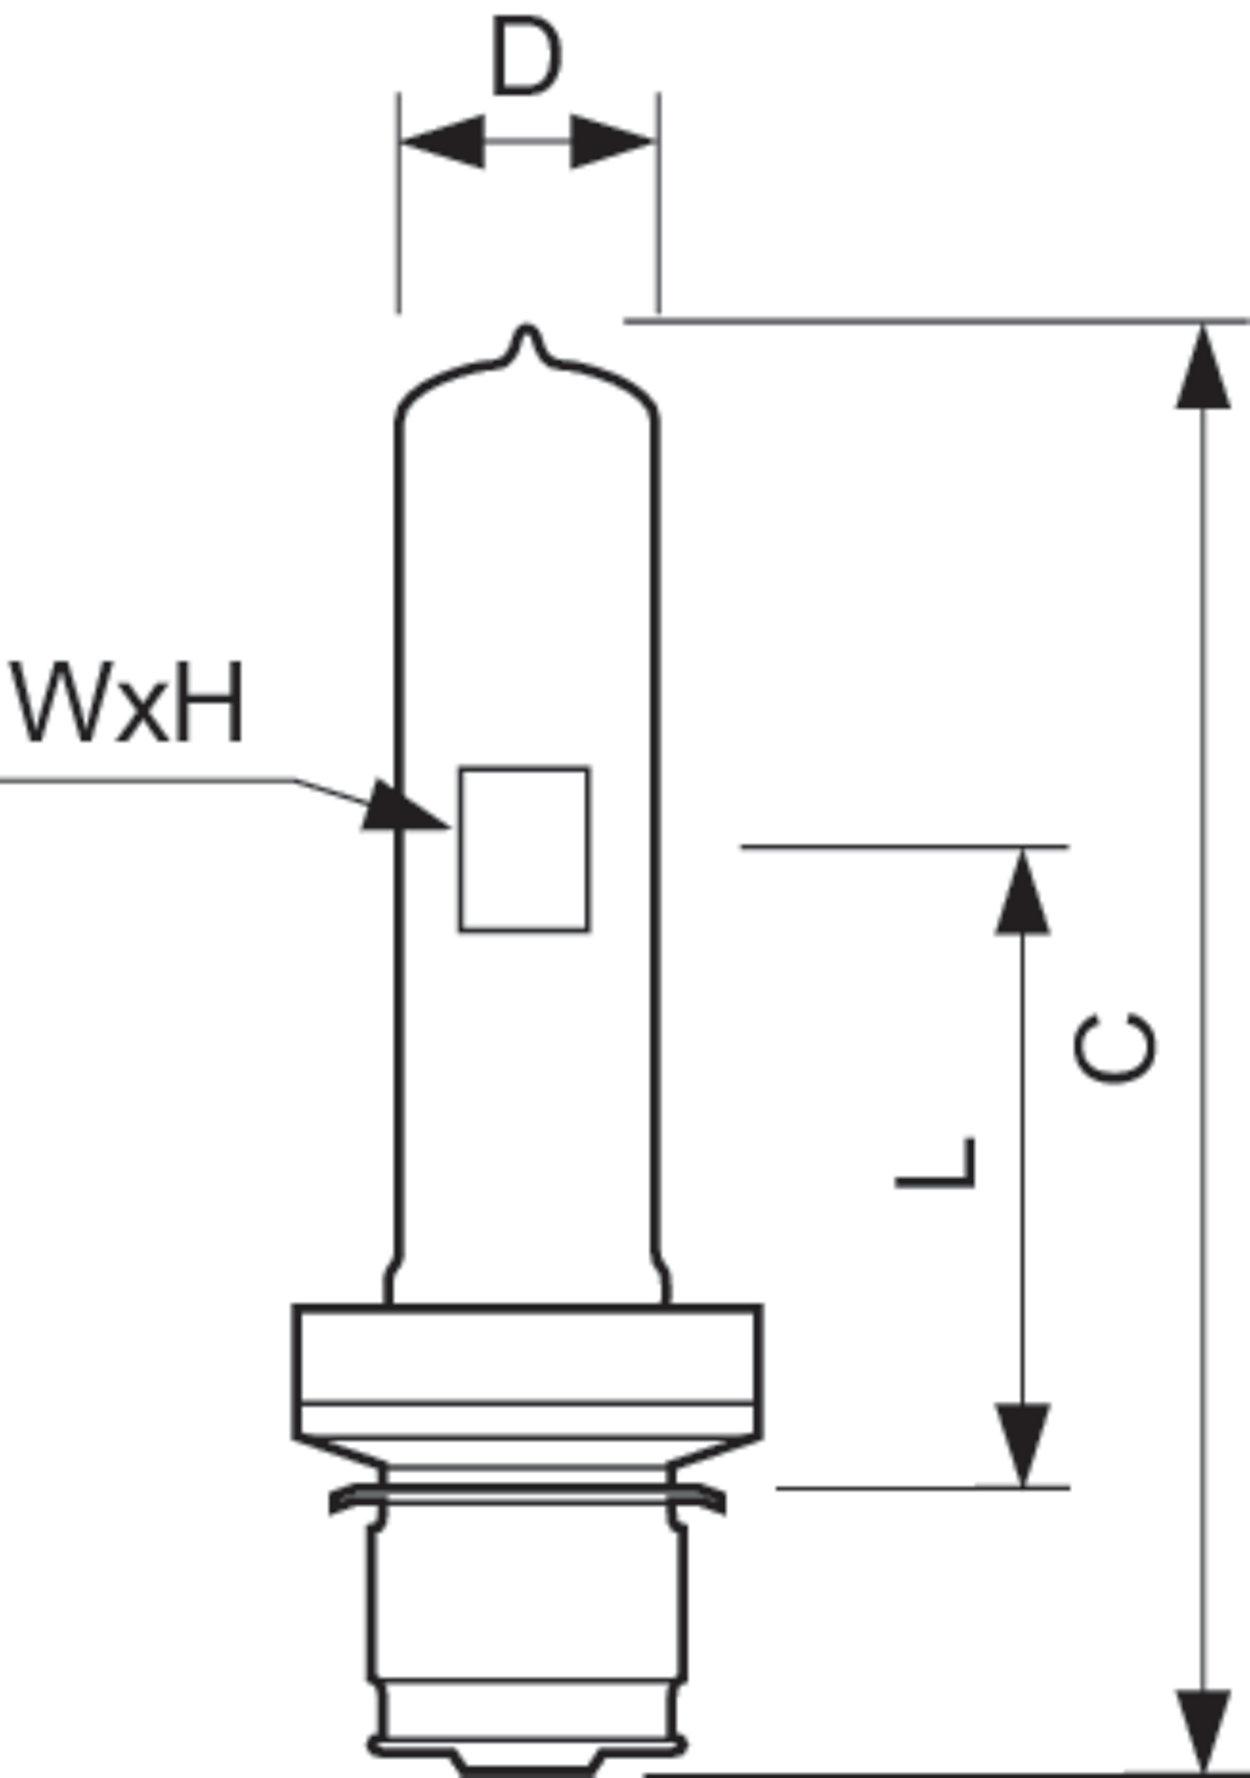 6800c 500w P28s 120v 1ct 10 Halogen High Voltage Se Theater Lighting Diagram Super Extended Lamp Life